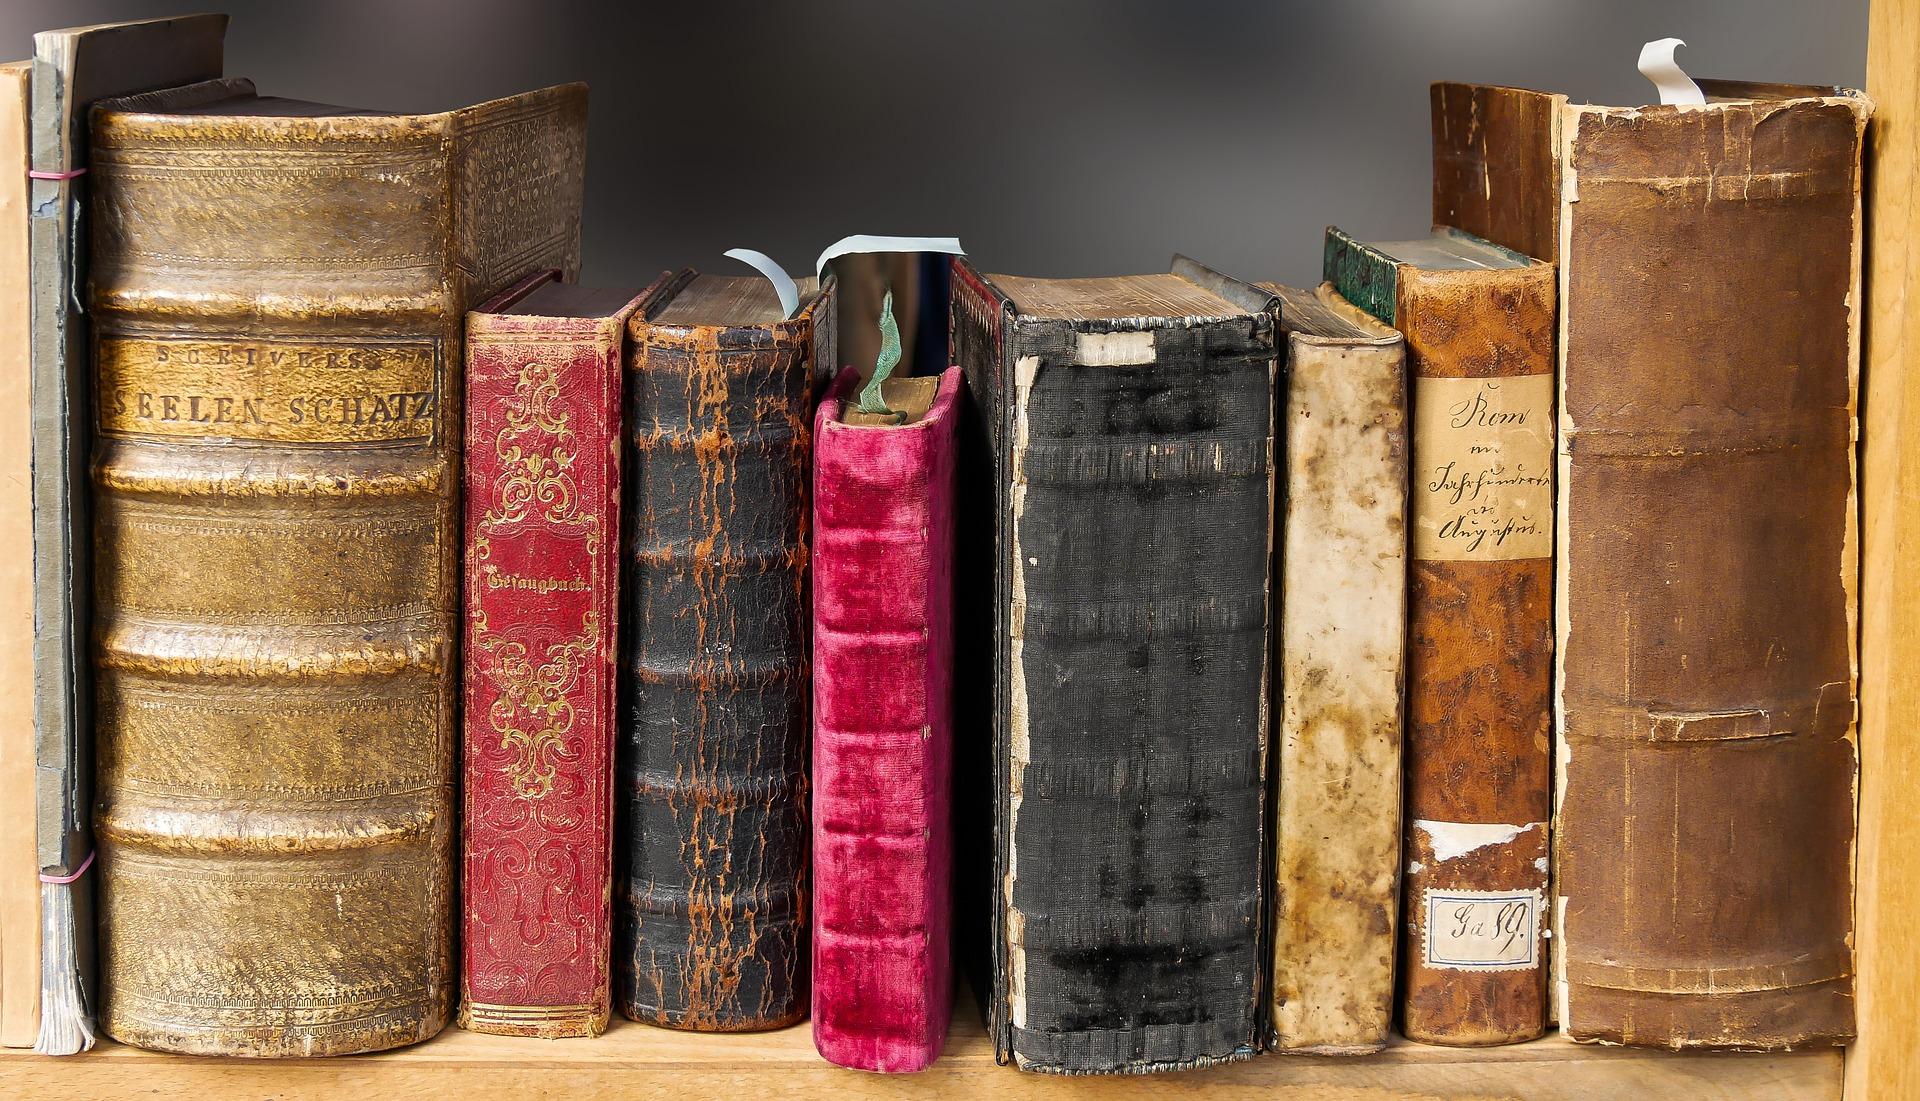 Publicar-un-libro-editar-Madrid-Barcelona-España-Cataluña-Catalunya-català-Andalucia-coedicion-autoedicion-tradicional-manuscrito